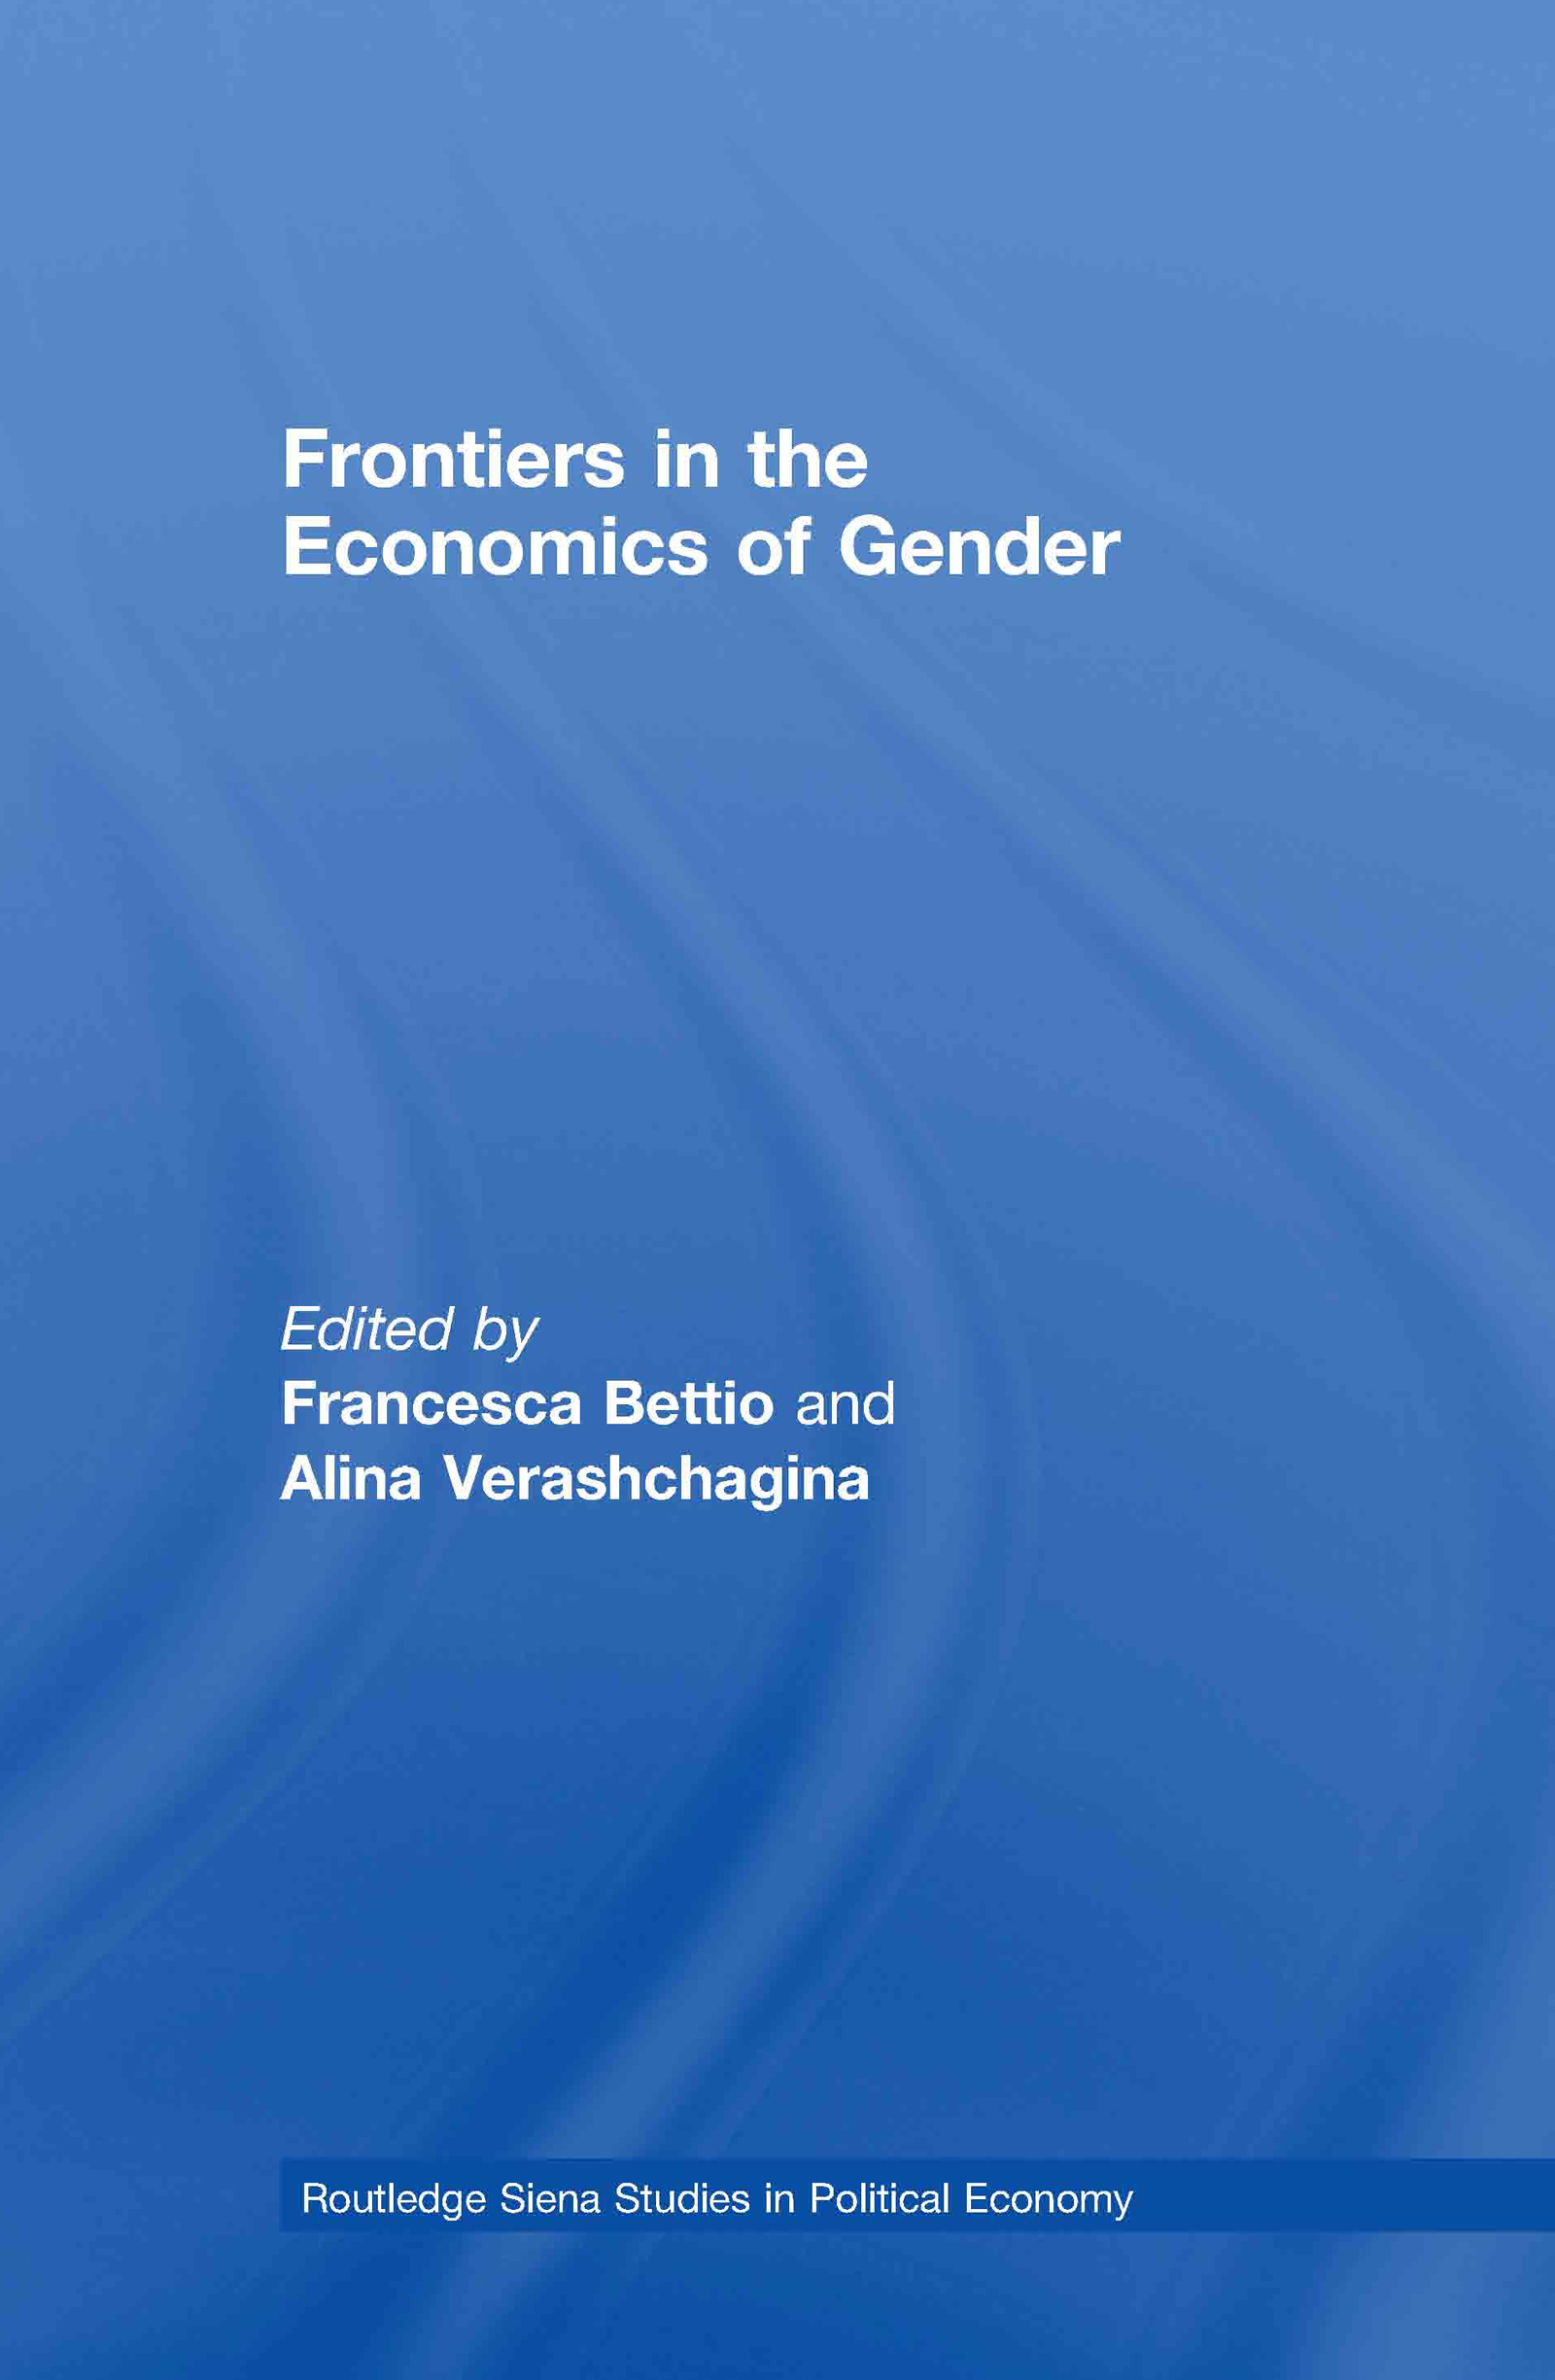 Frontiers in the Economics of Gender book cover